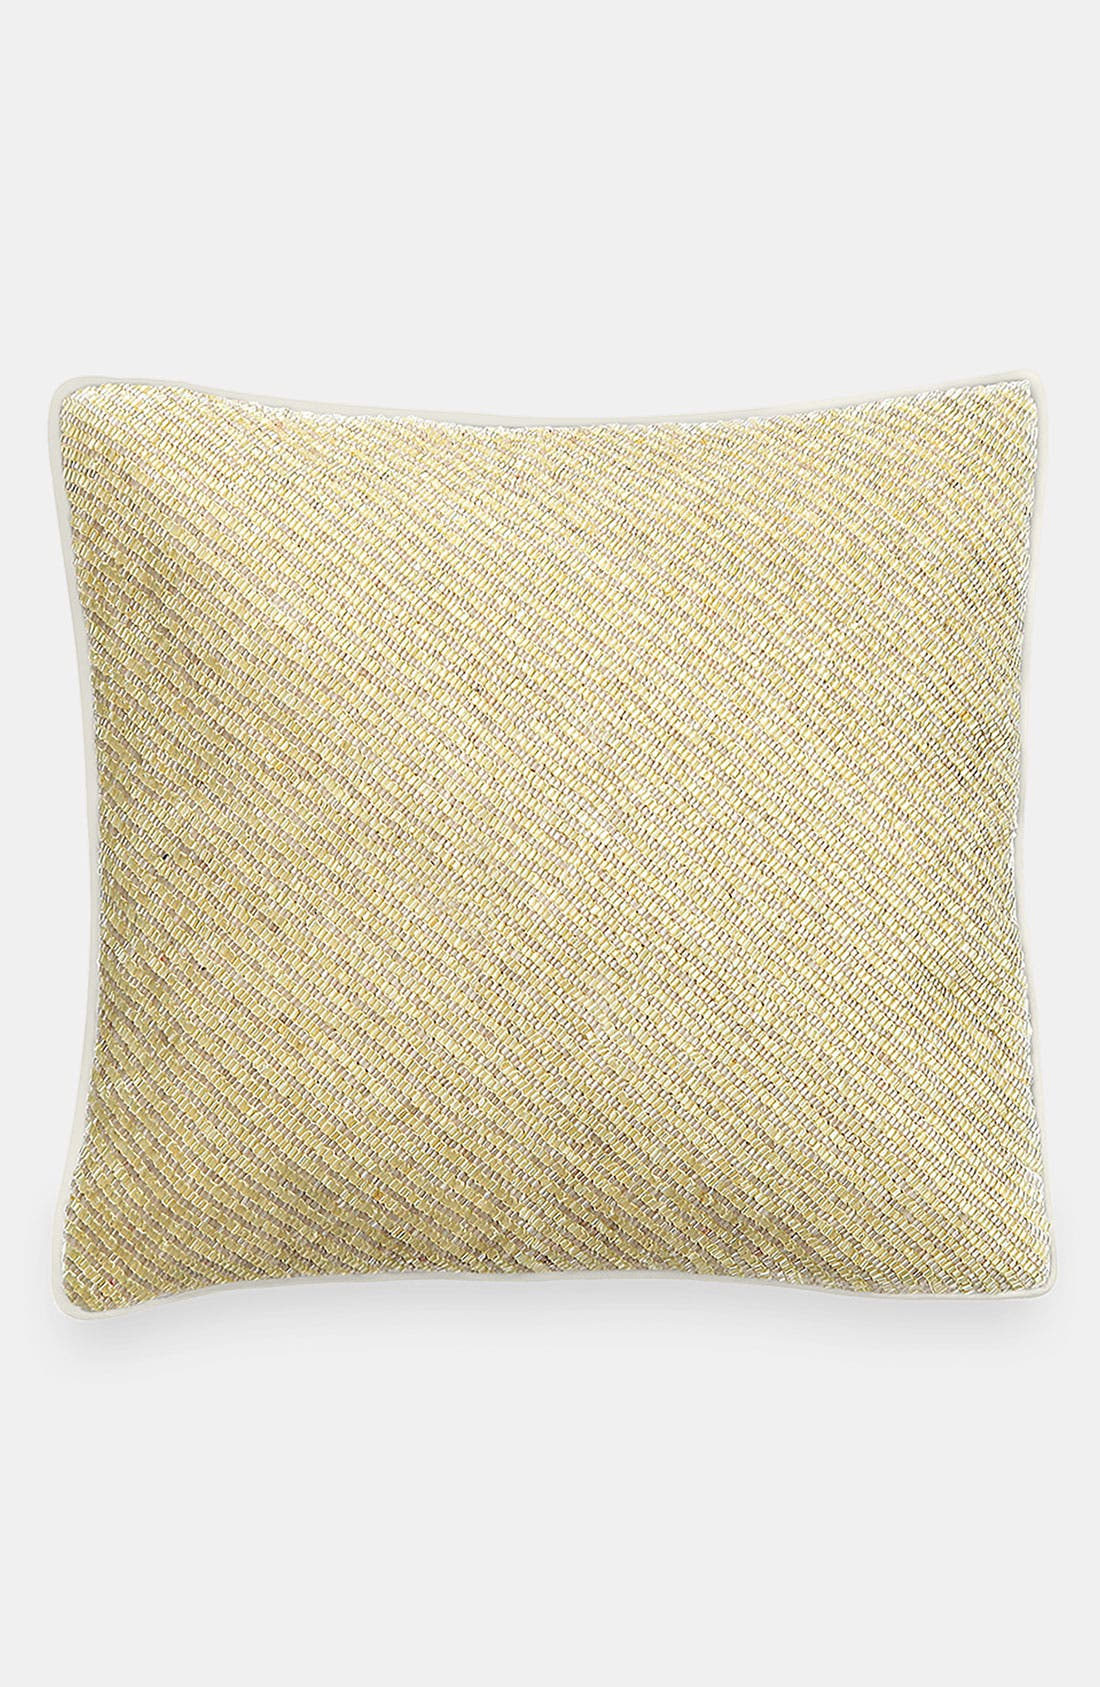 Alternate Image 1 Selected - kate spade new york 'bugle beads' decorative pillow